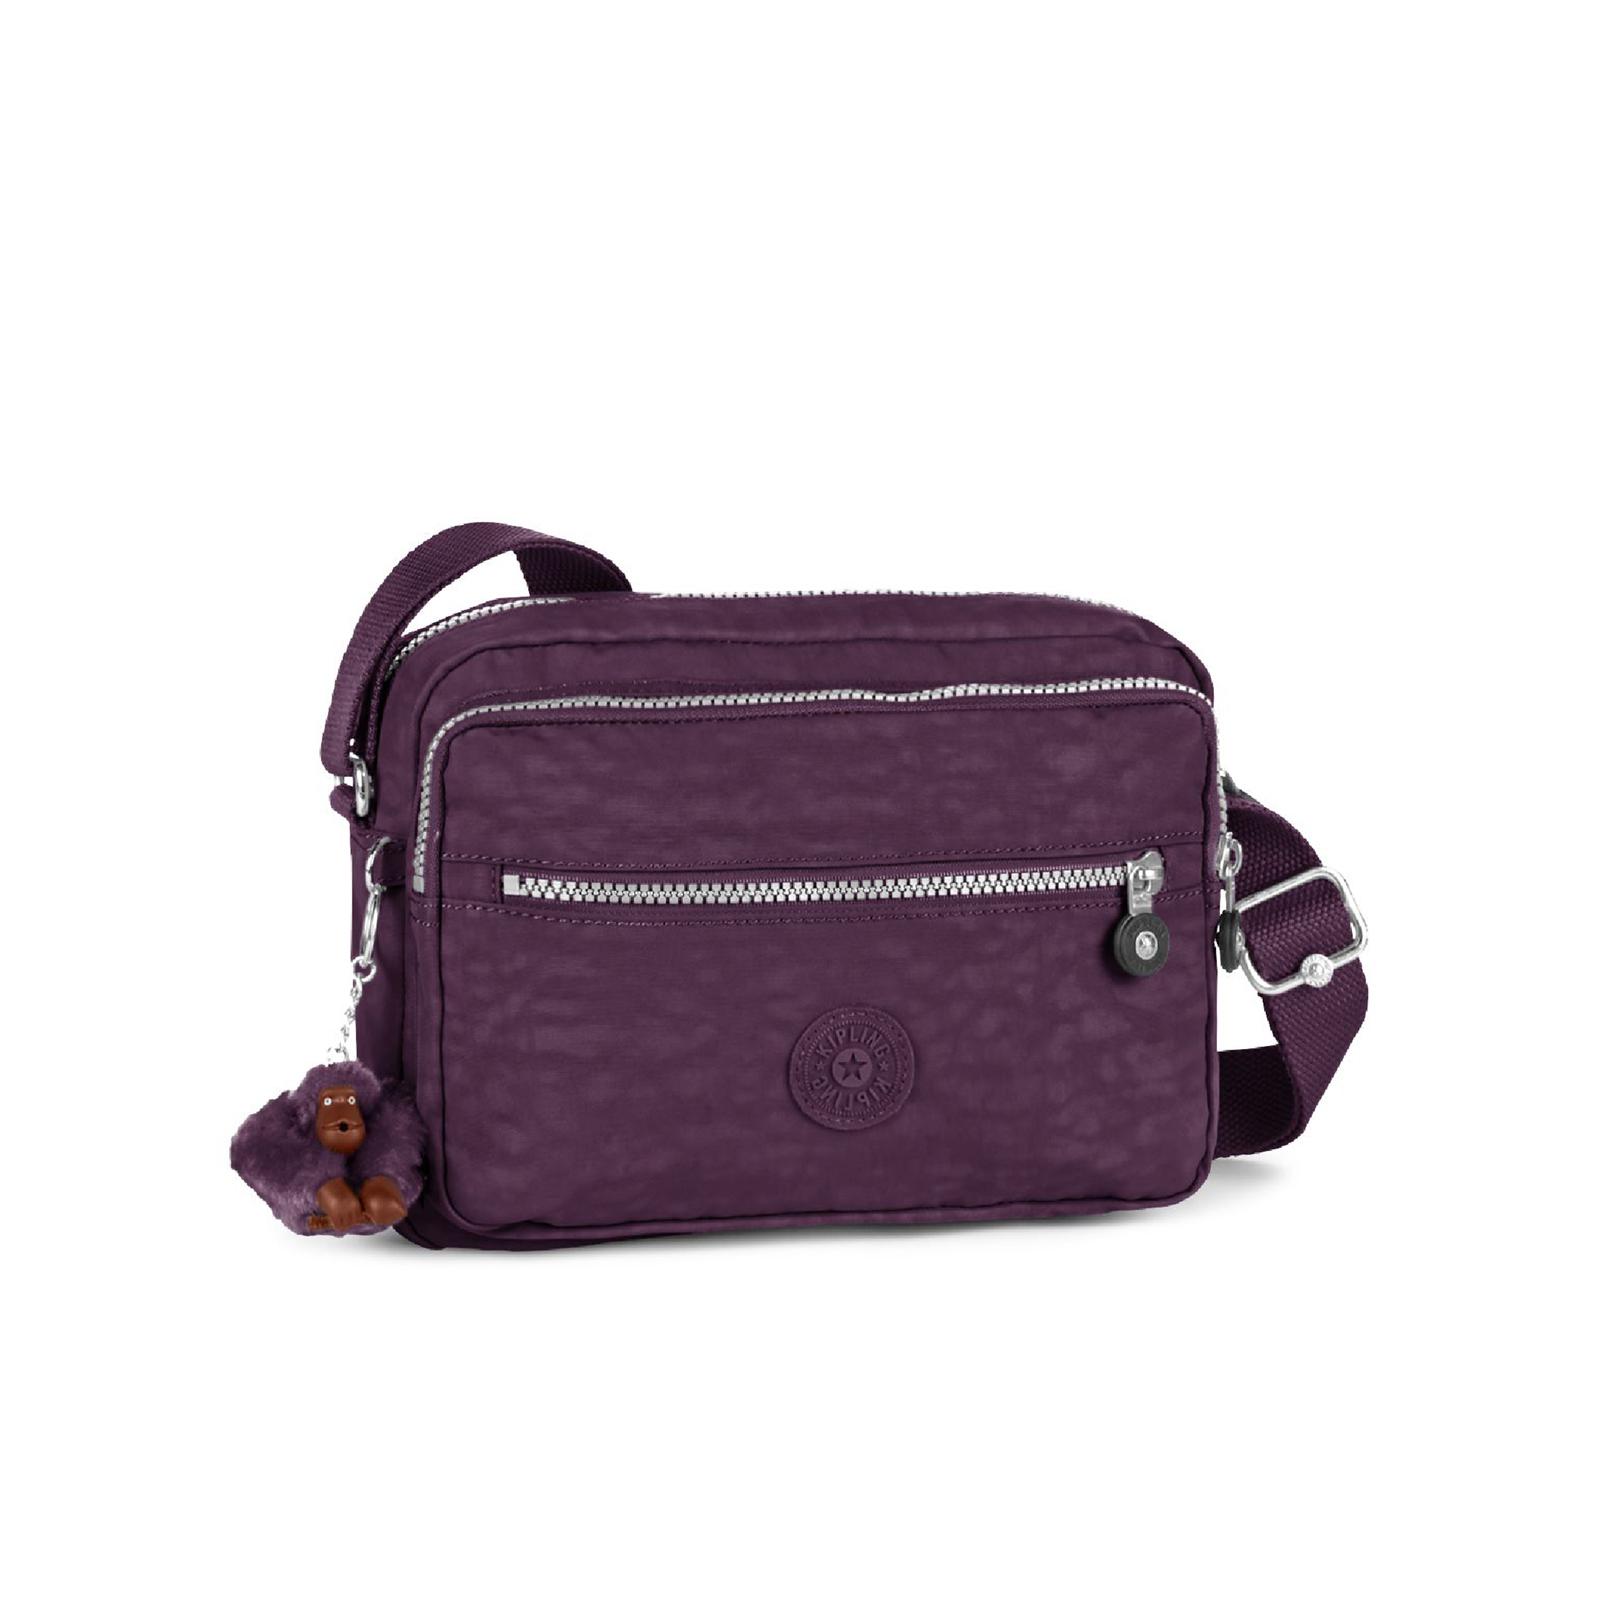 47f104e02 Kipling Women's Deena Medium Cross Body Bag - Plum Purple